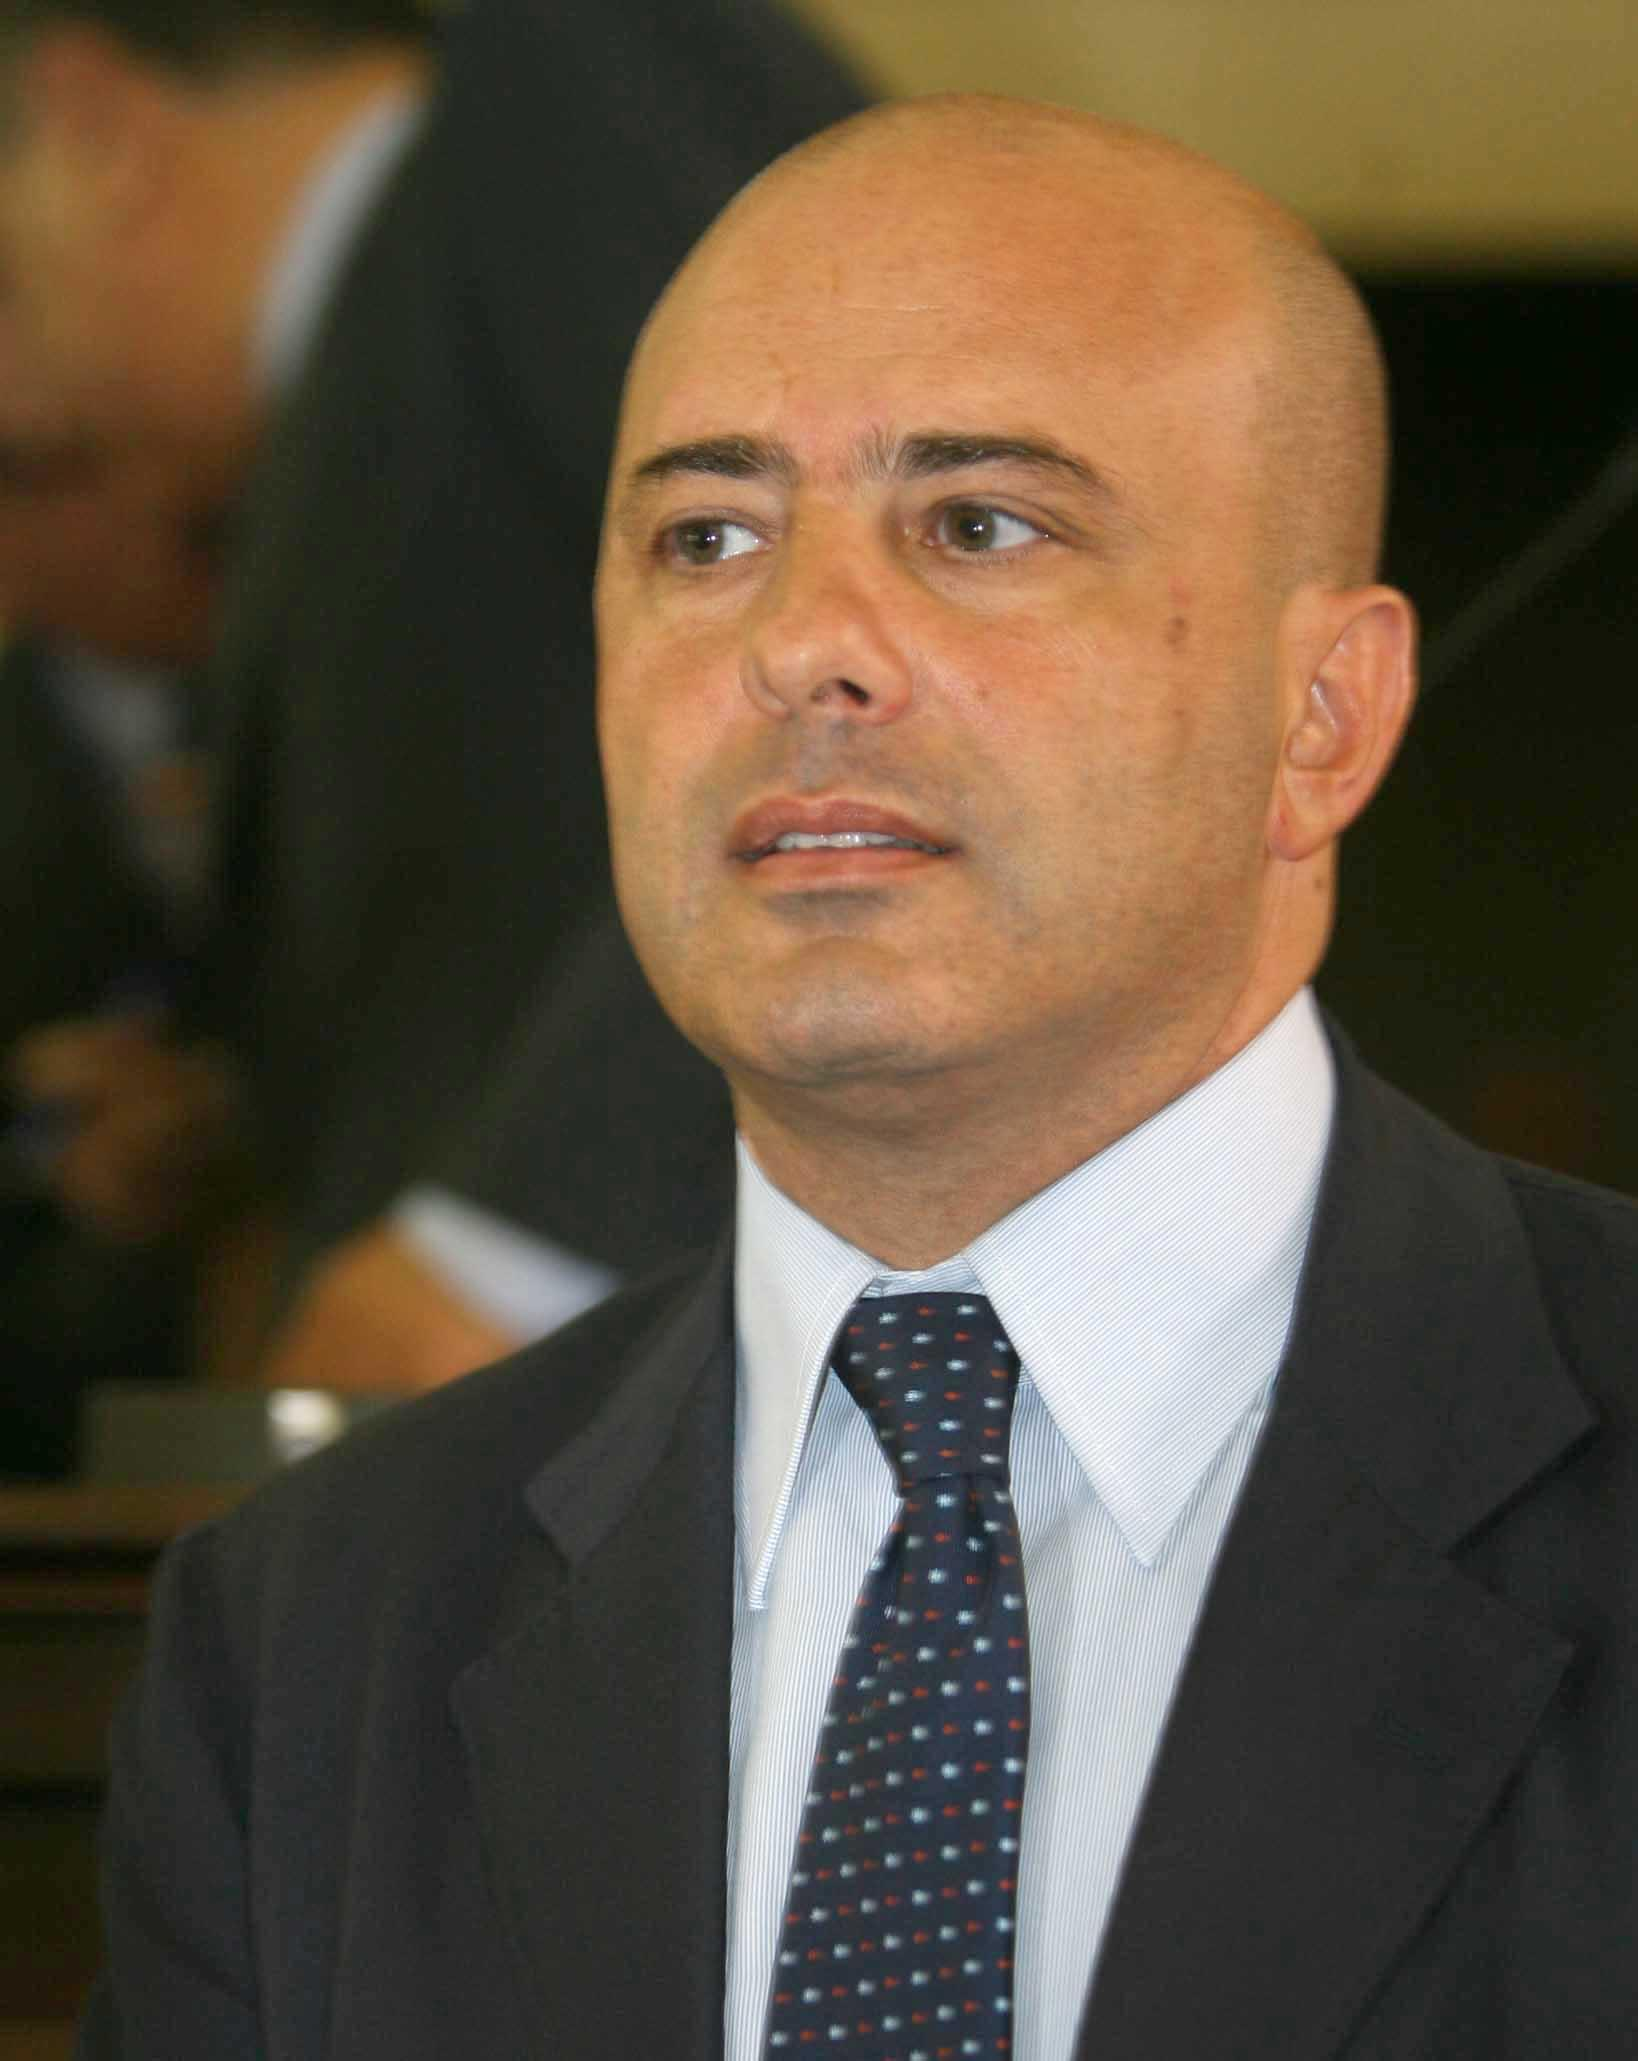 ANTONIO PENTANGELO - Consigliere Napoli